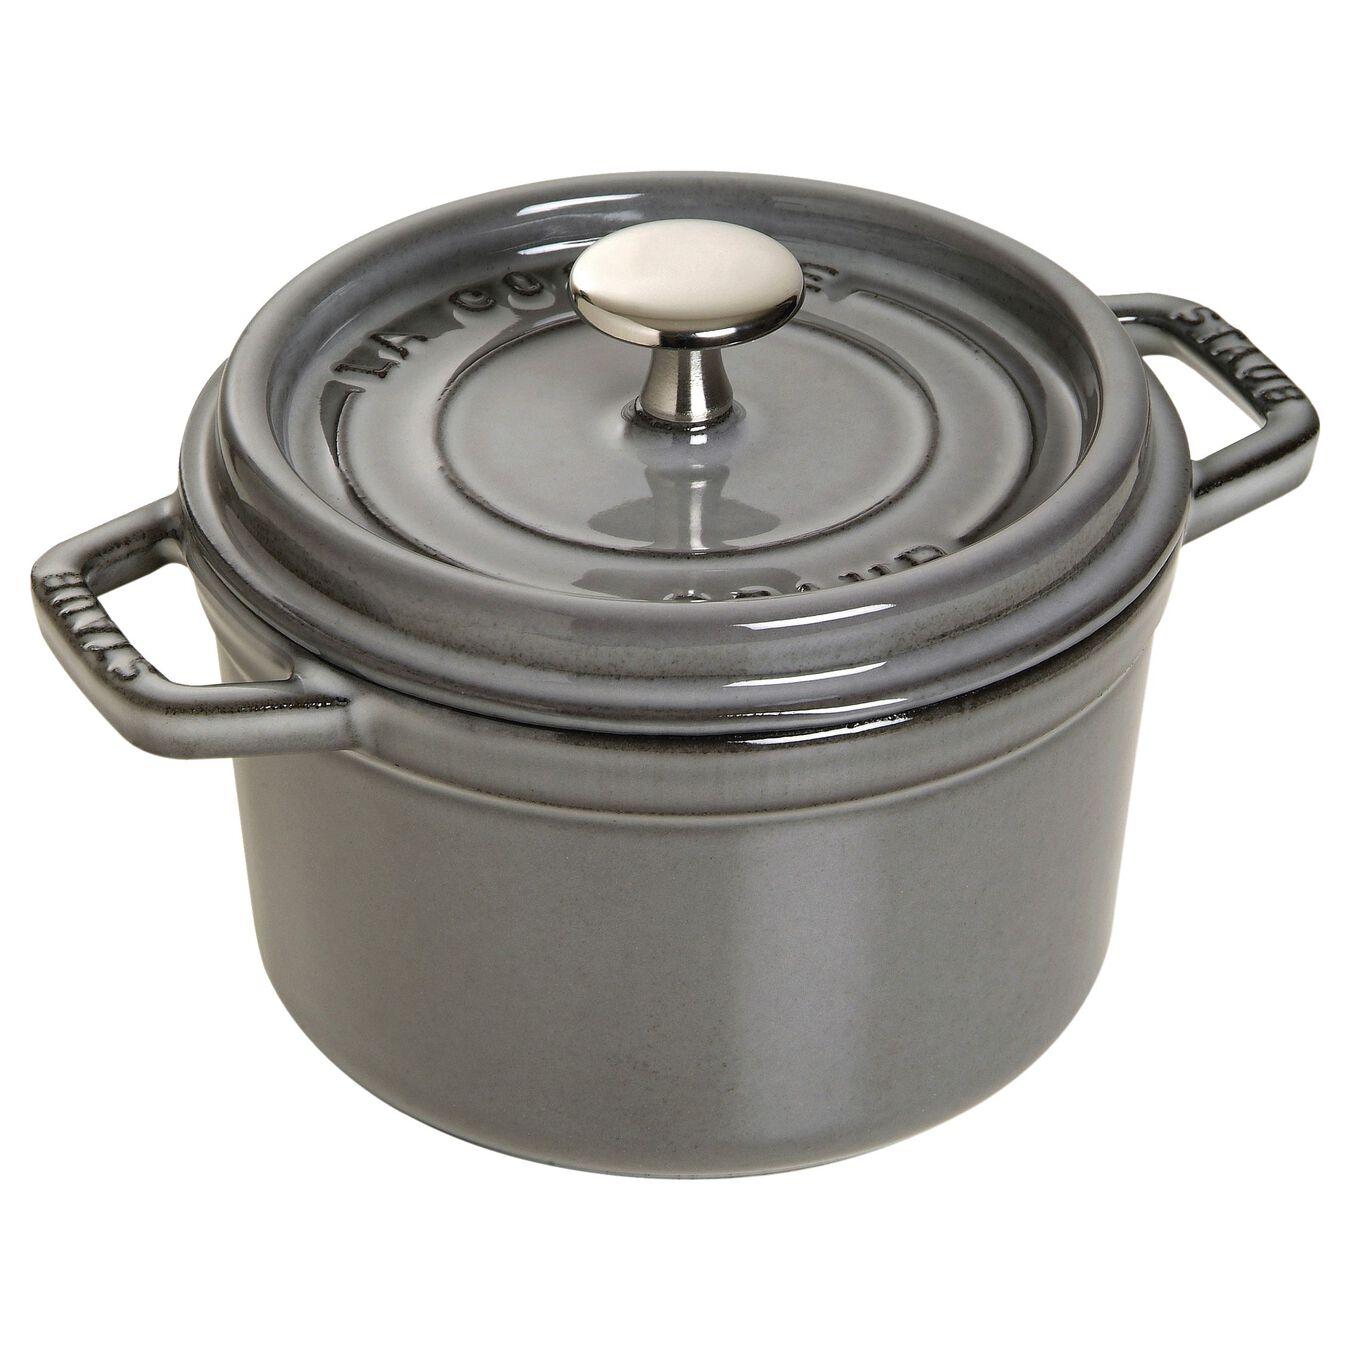 Cocotte rotonda - 14 cm, Colore grigio grafite,,large 1